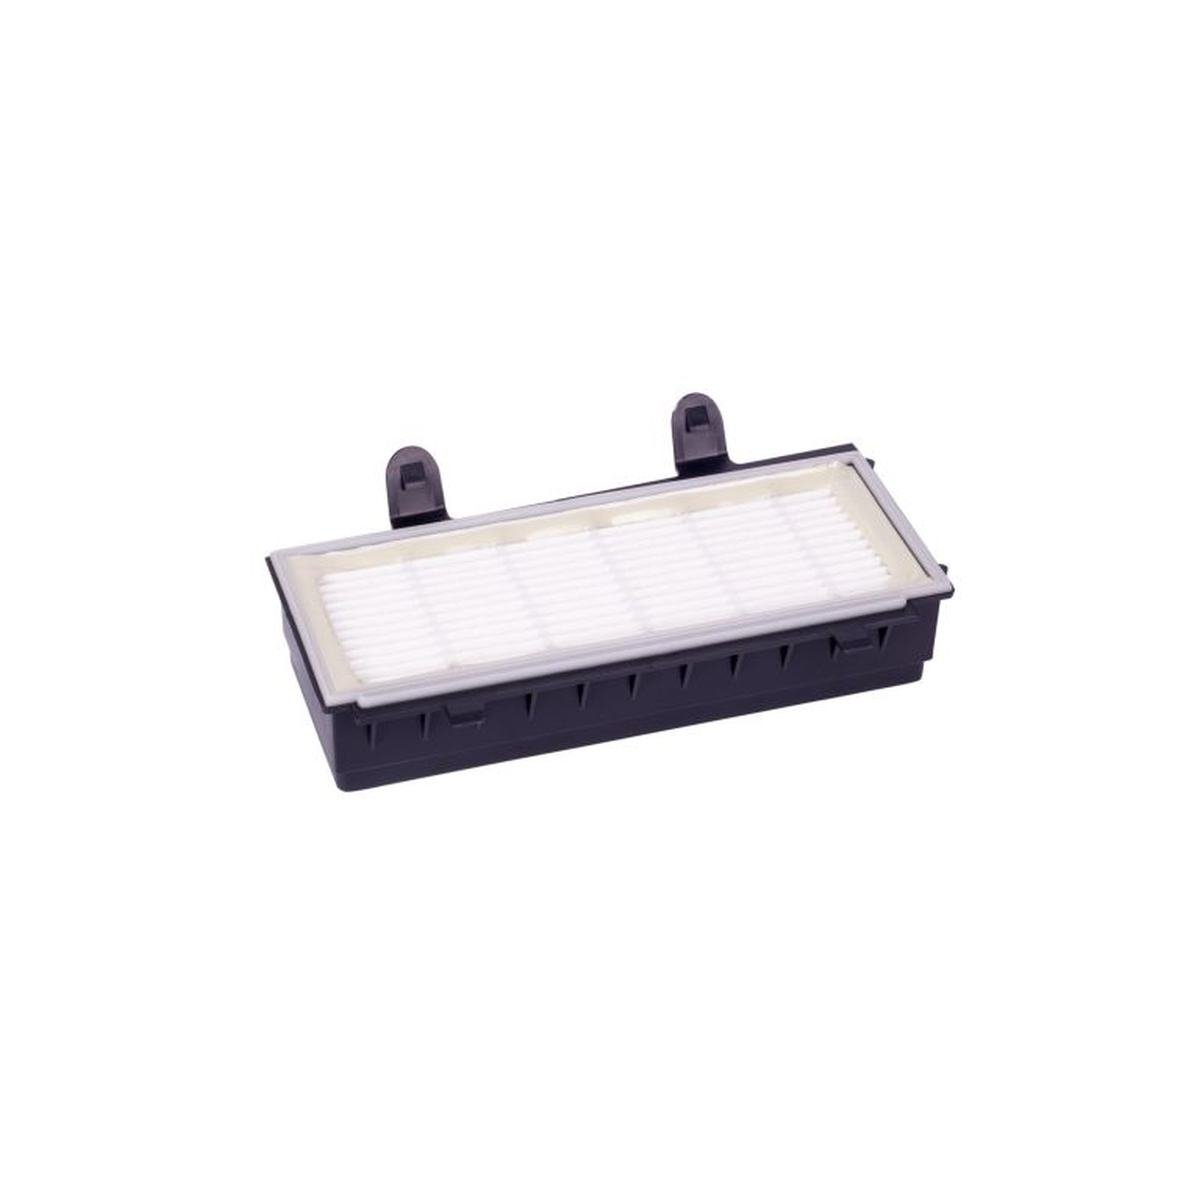 Hepa filter 165x80x50mm